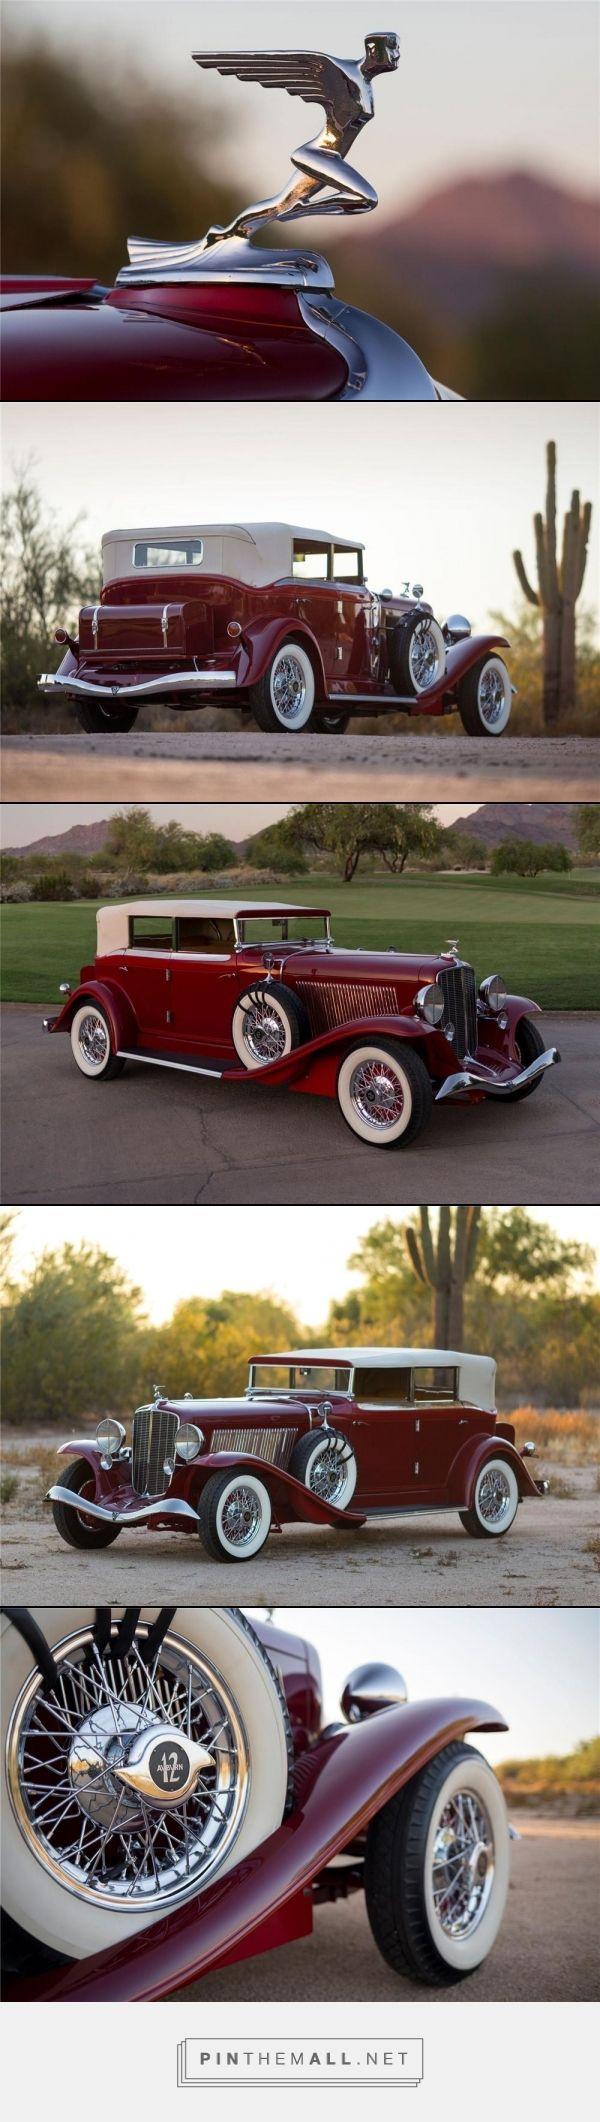 1955 dodge royal lancer convertible cream black fvr cars - 1933 Auburn 12 161a Salon Phaeton Convertible